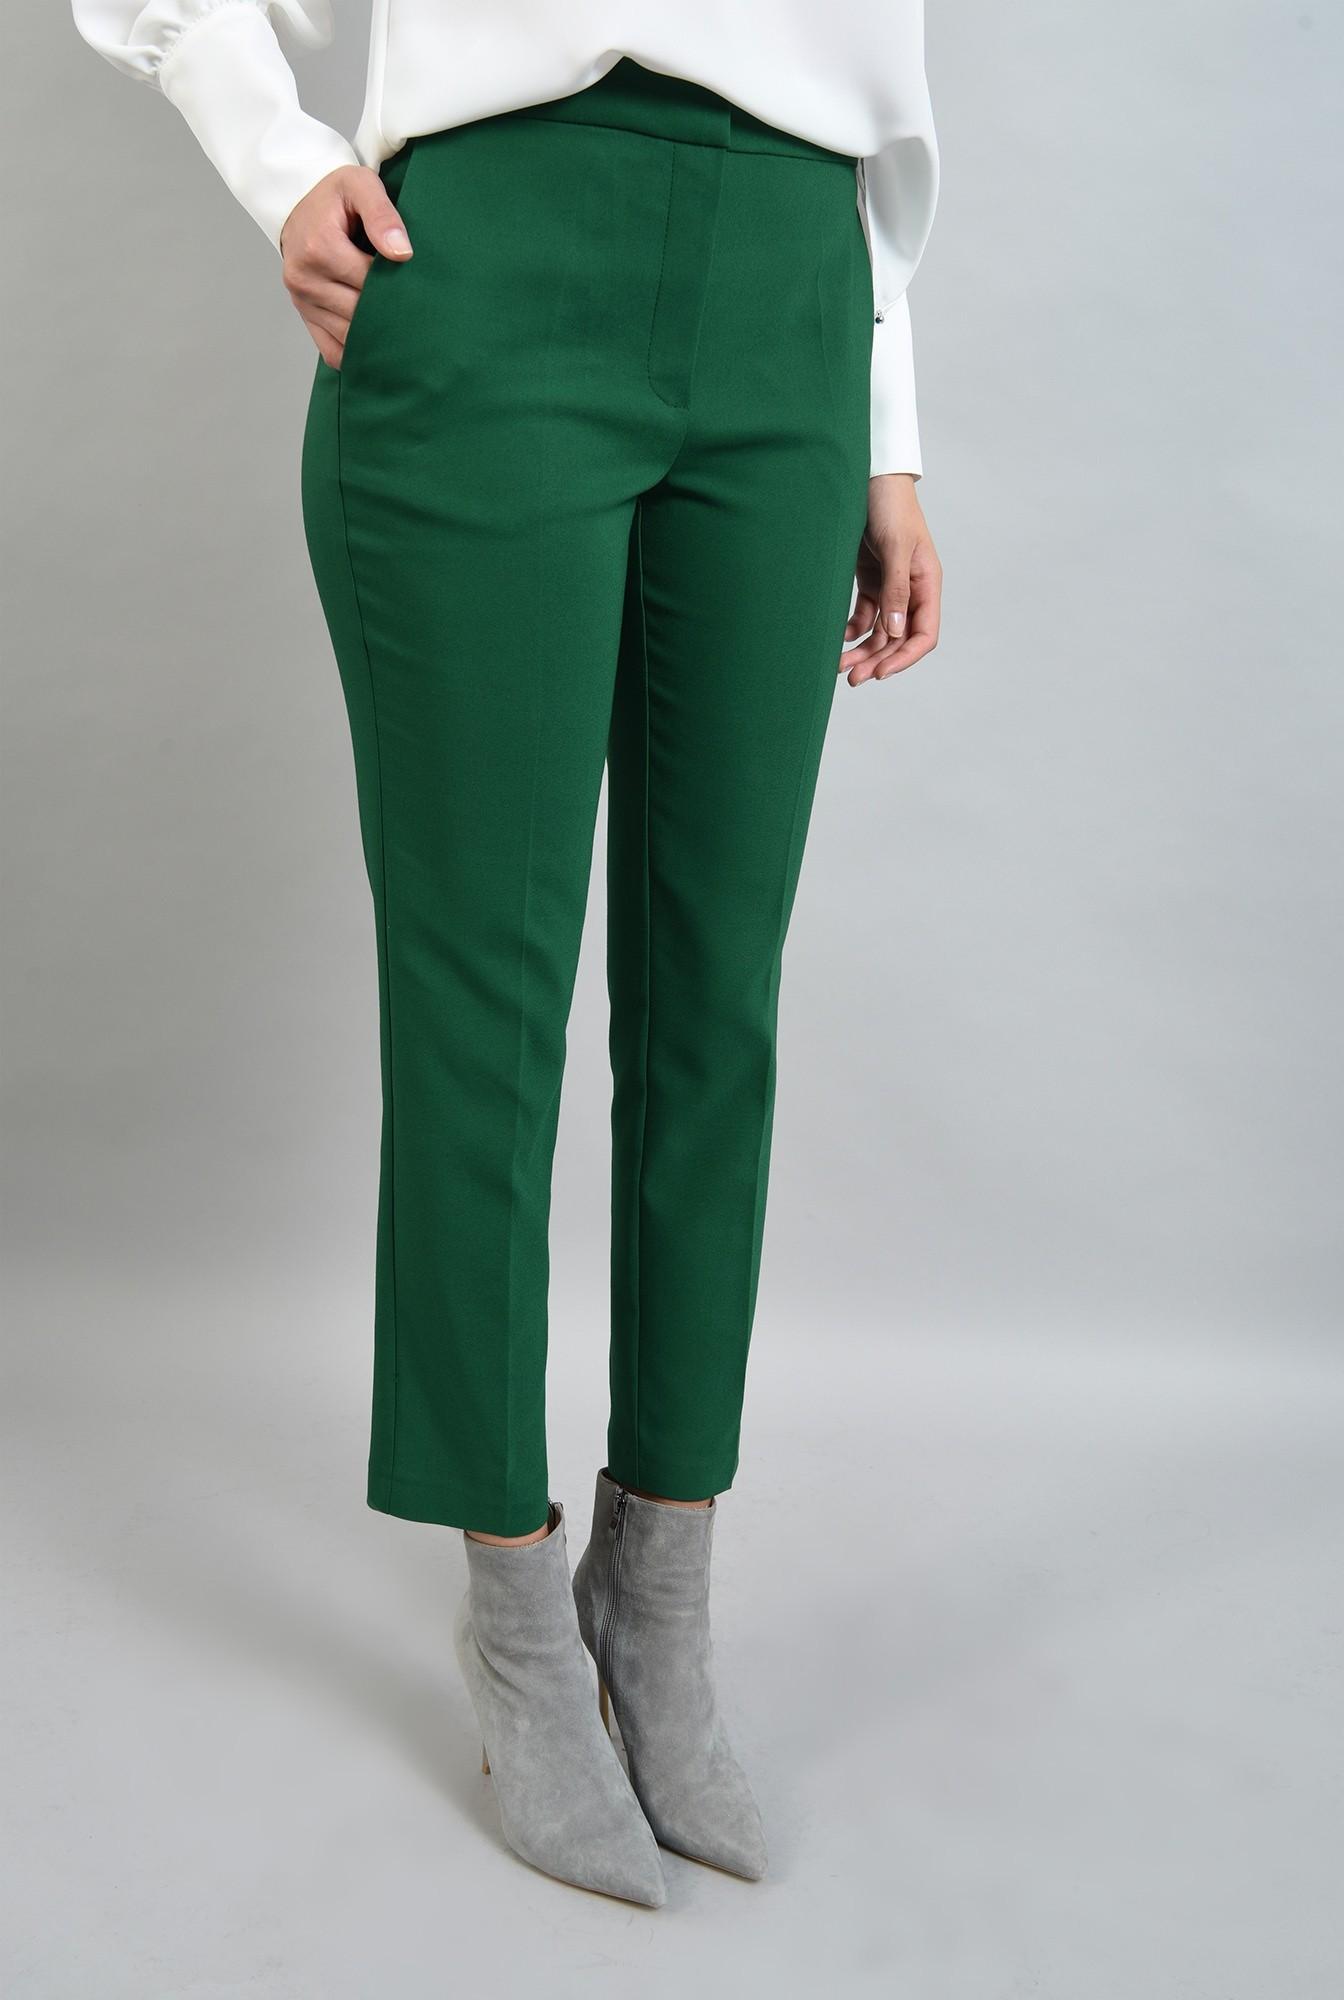 1 - pantaloni verzi, croi conic, Poema